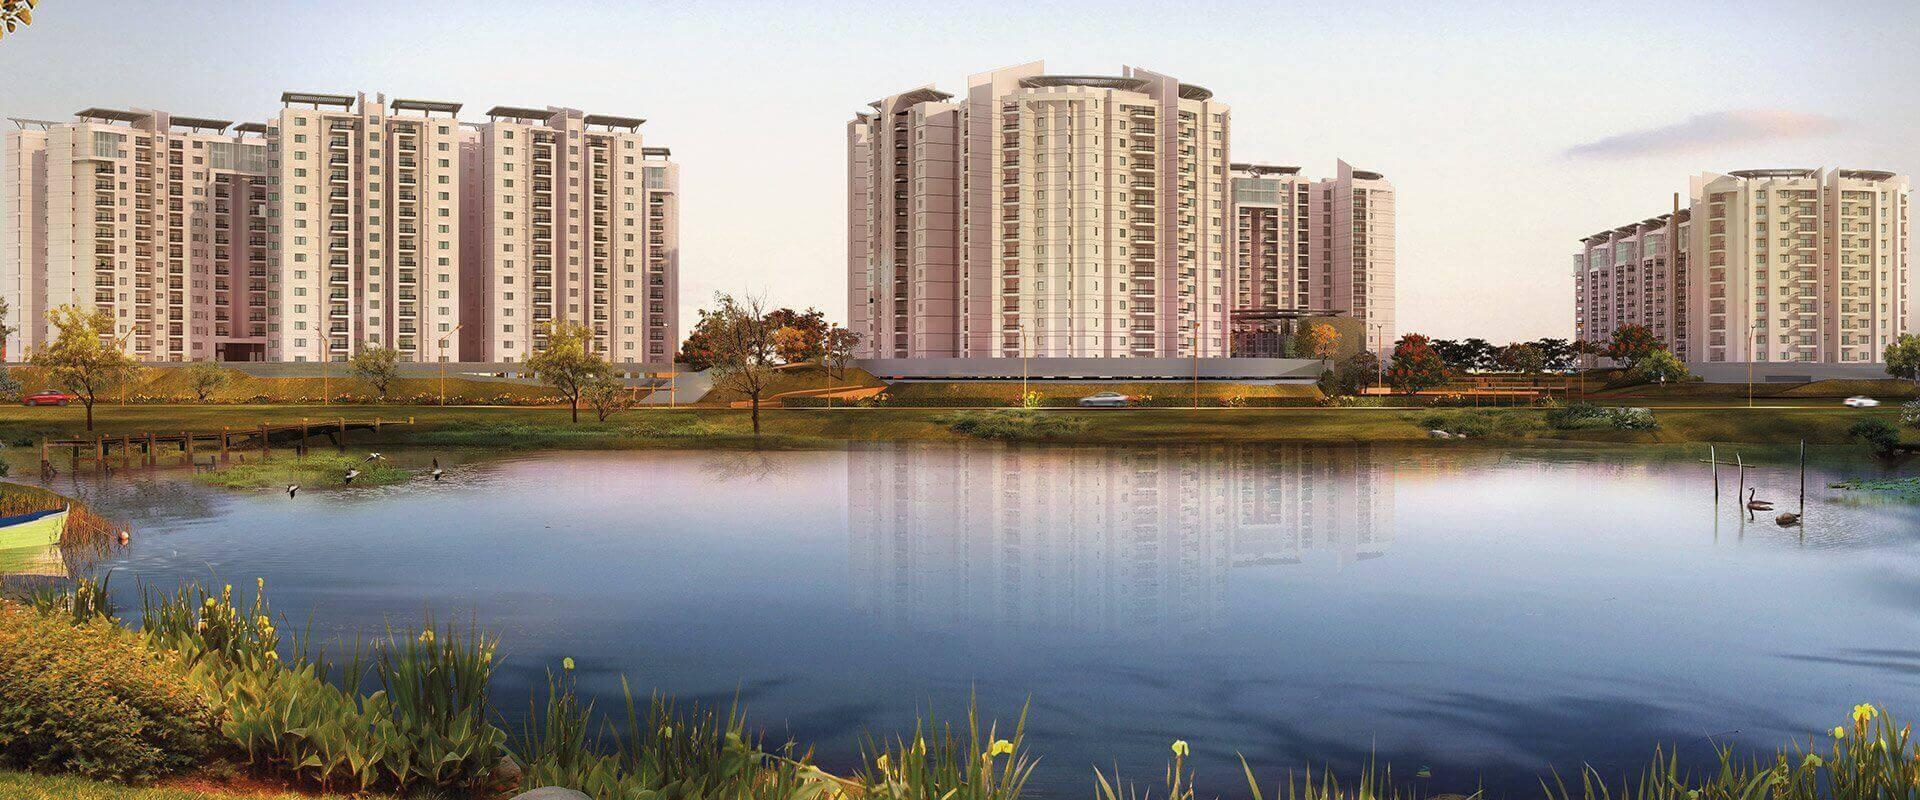 Brigade Lakefront - EPIP Zone, Whitefield, Bangalore